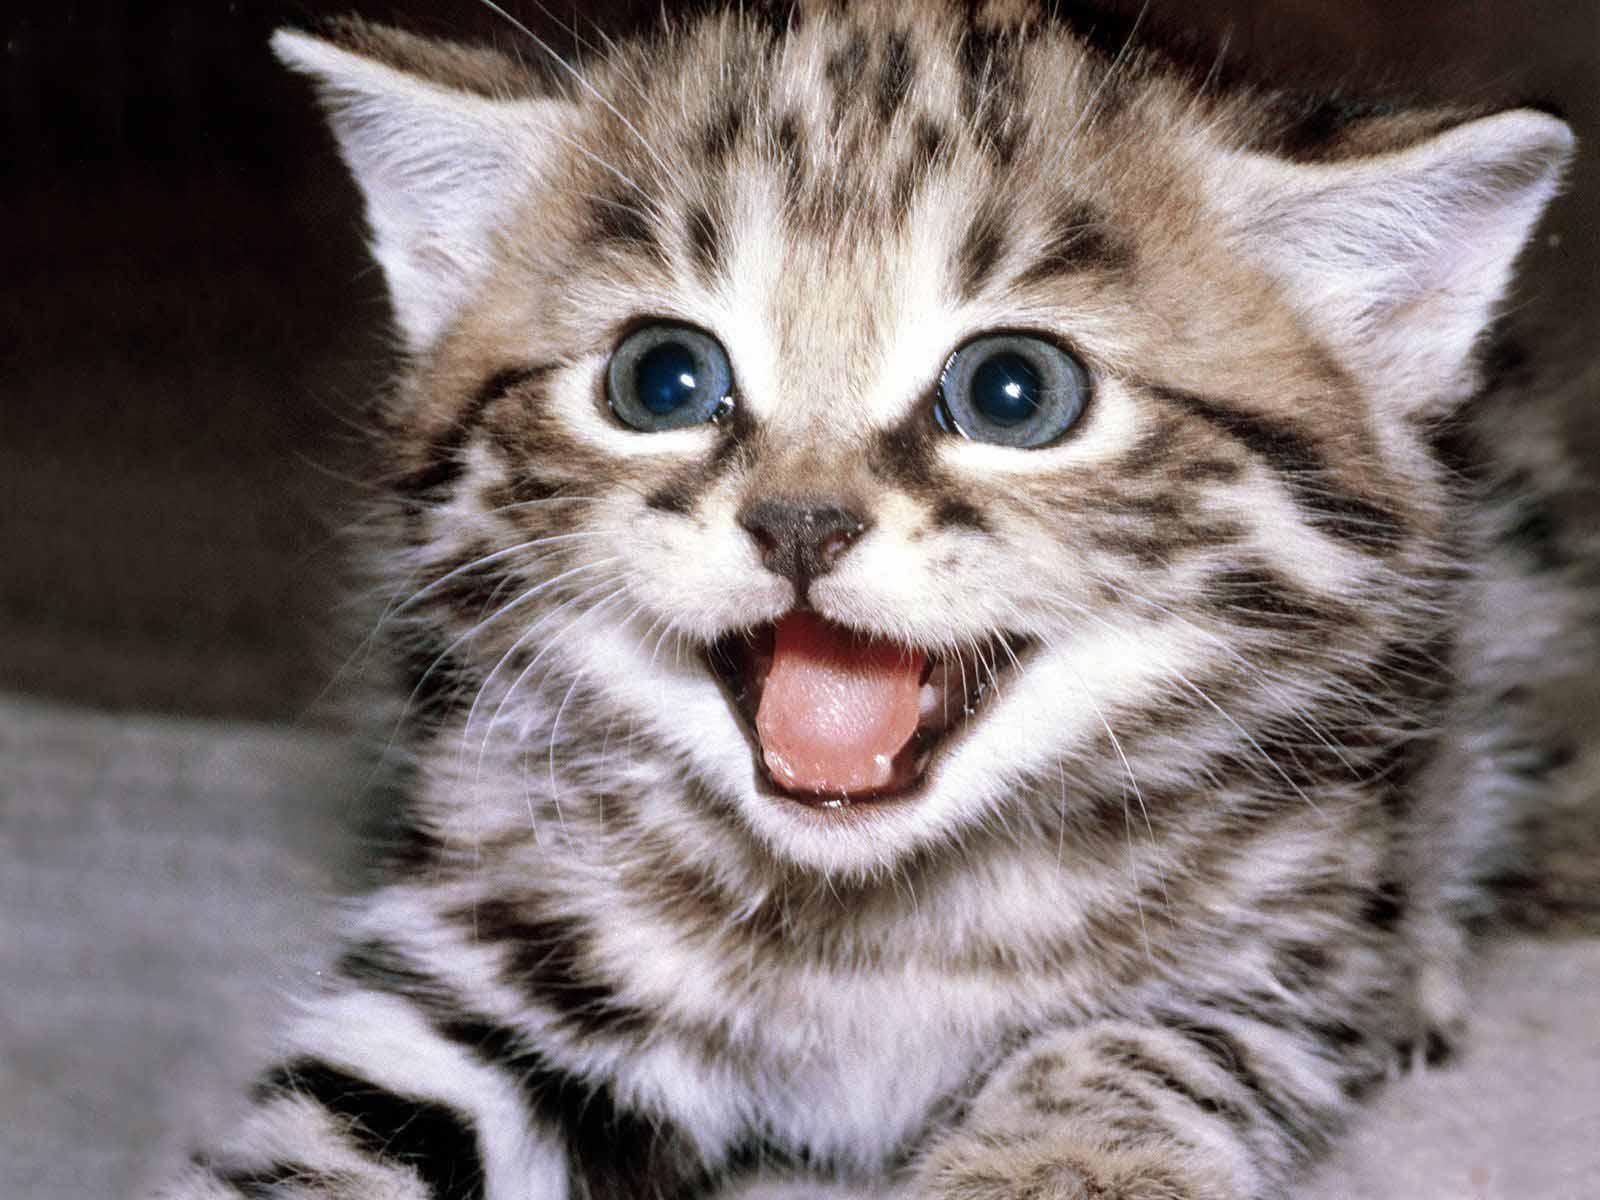 http://3.bp.blogspot.com/-4kBvHvCJnOY/T-iKBteyTKI/AAAAAAAABLw/CwDU11DBqWc/s1600/kitten.jpeg